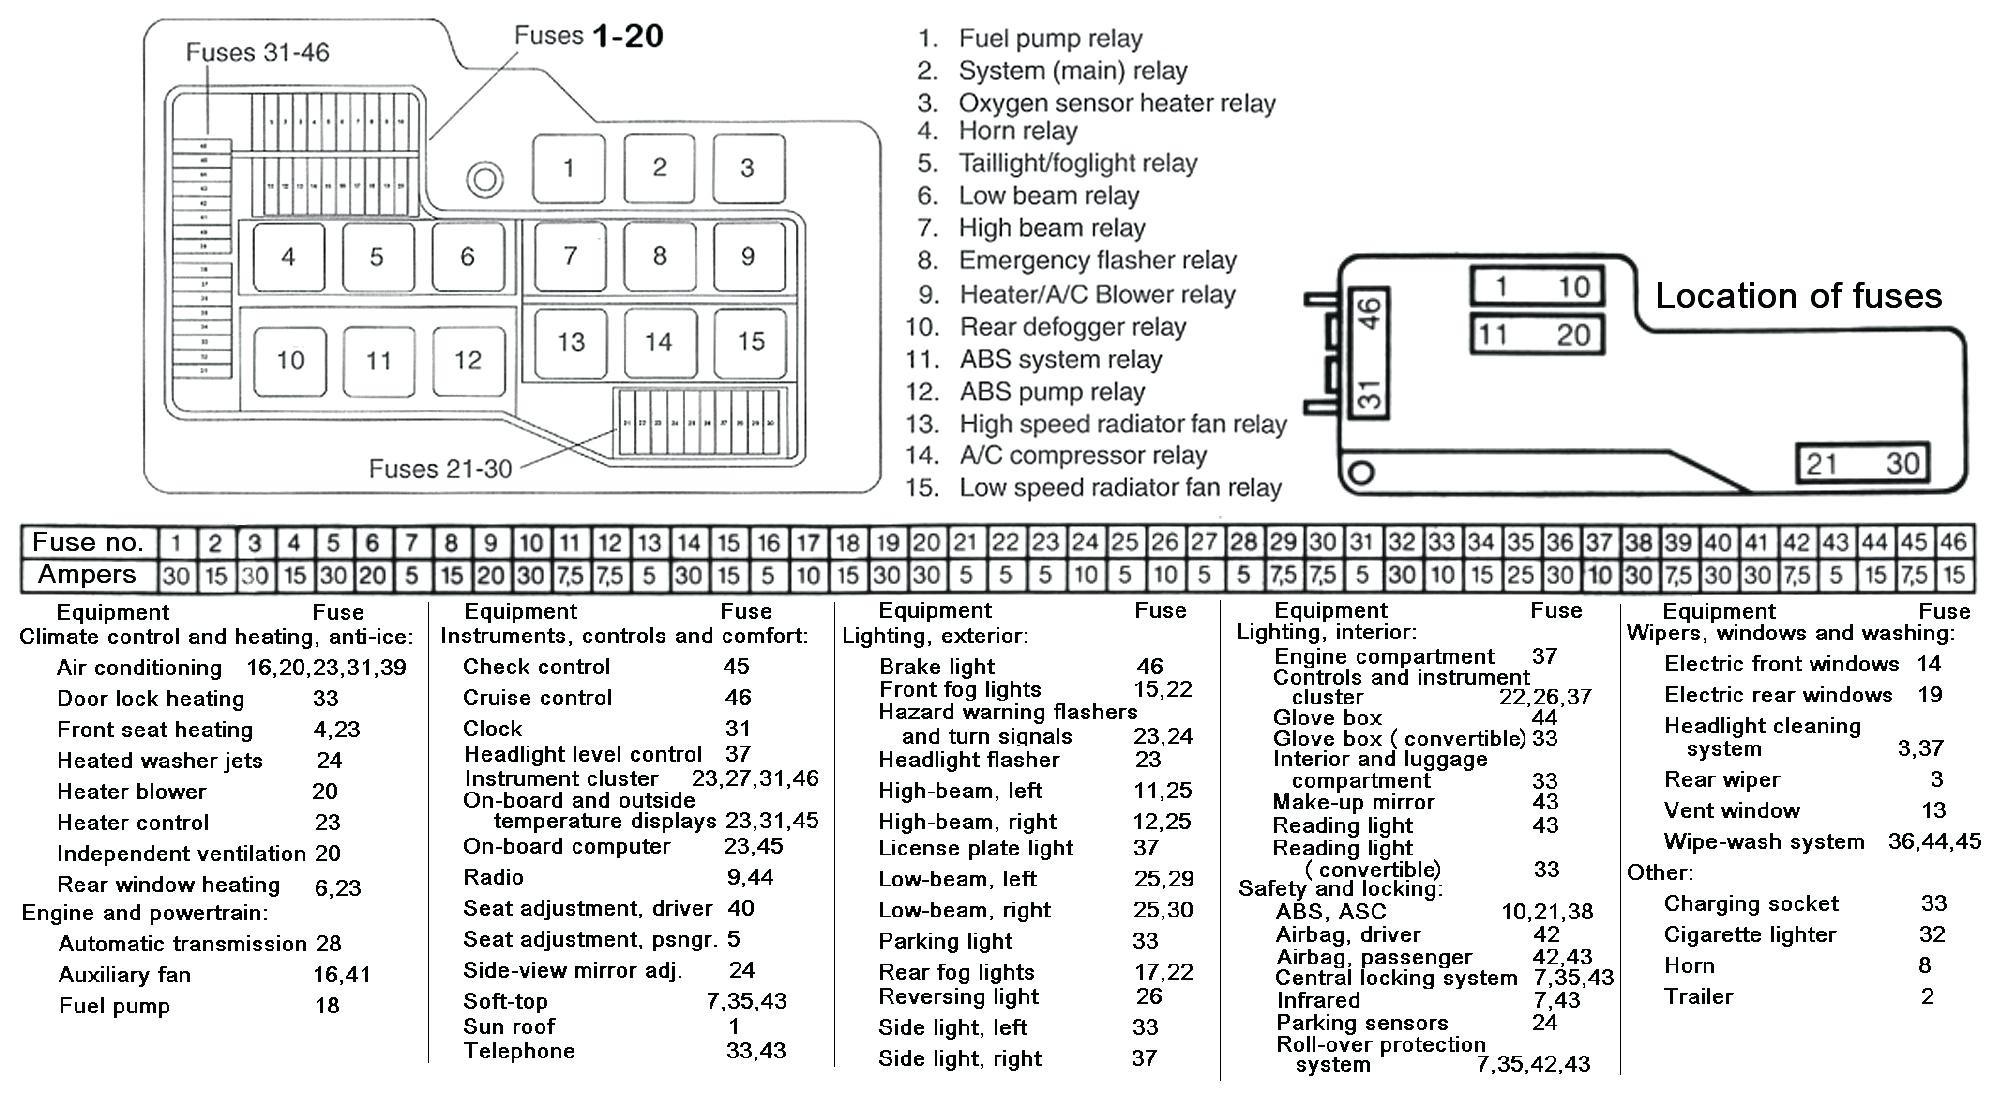 [SCHEMATICS_4PO]  DX_3166] 2000 Jaguar Xj8 Fuse Box Diagram Additionally 2000 Lexus Es300  Engine Free Diagram | Lexus Fuse Box Diagram |  | Tivexi Lious Inrebe Mohammedshrine Librar Wiring 101